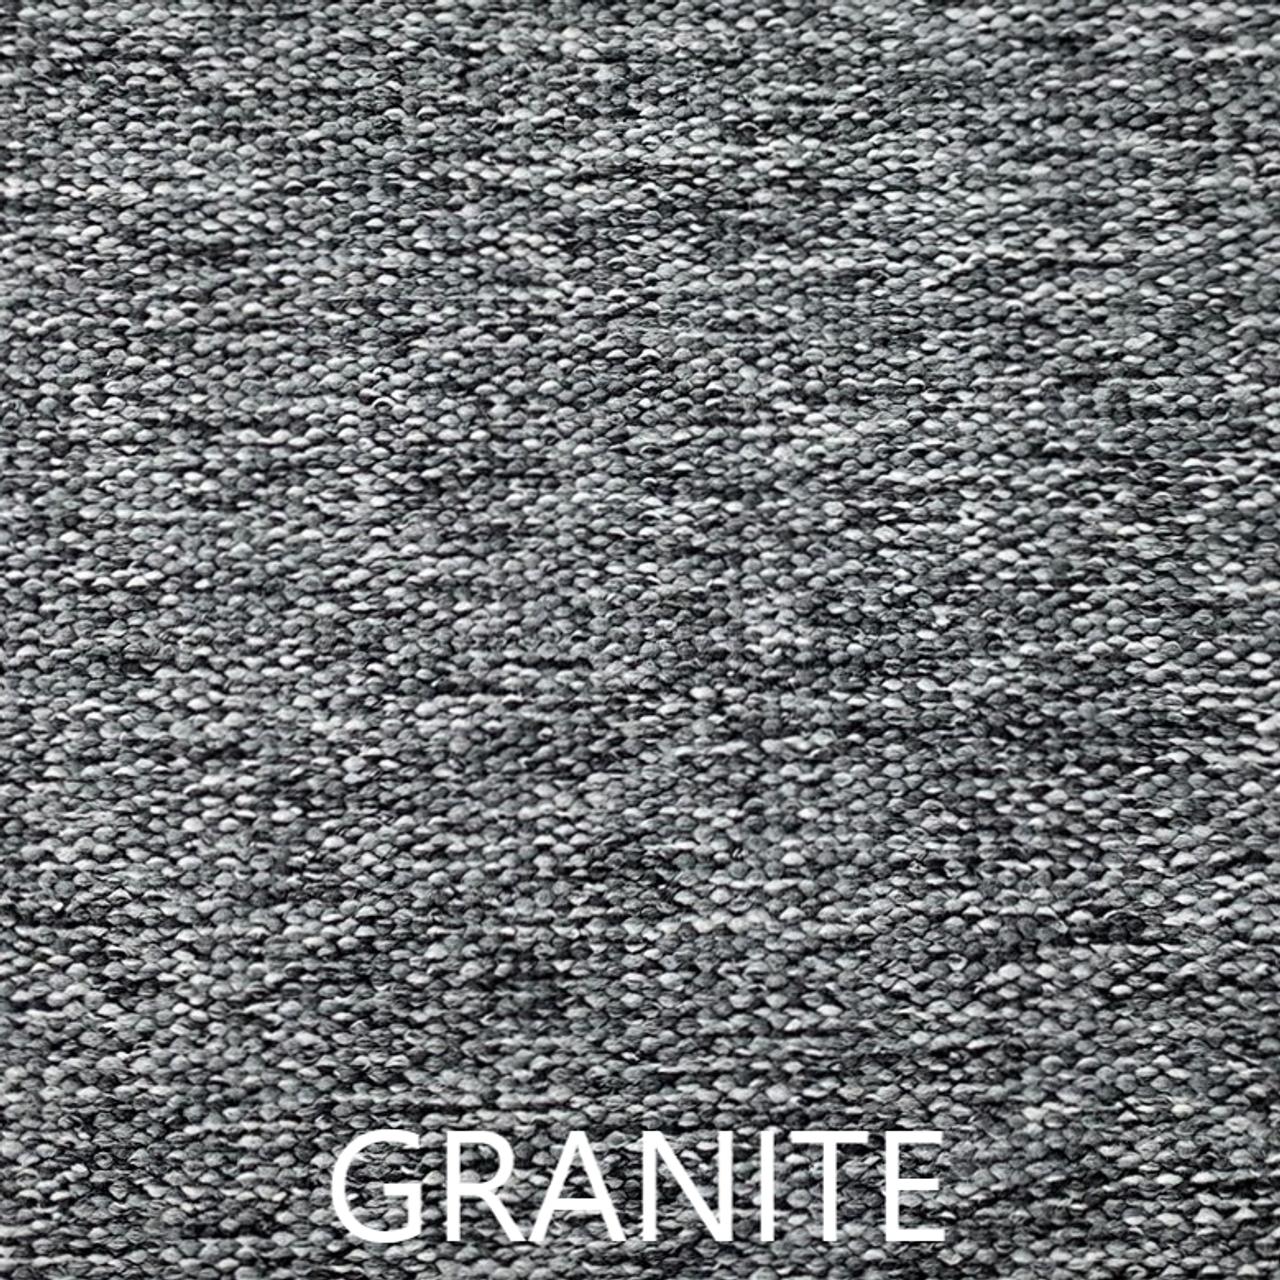 779 GRANITE, Mohawk Abeam AR16 Carpeting